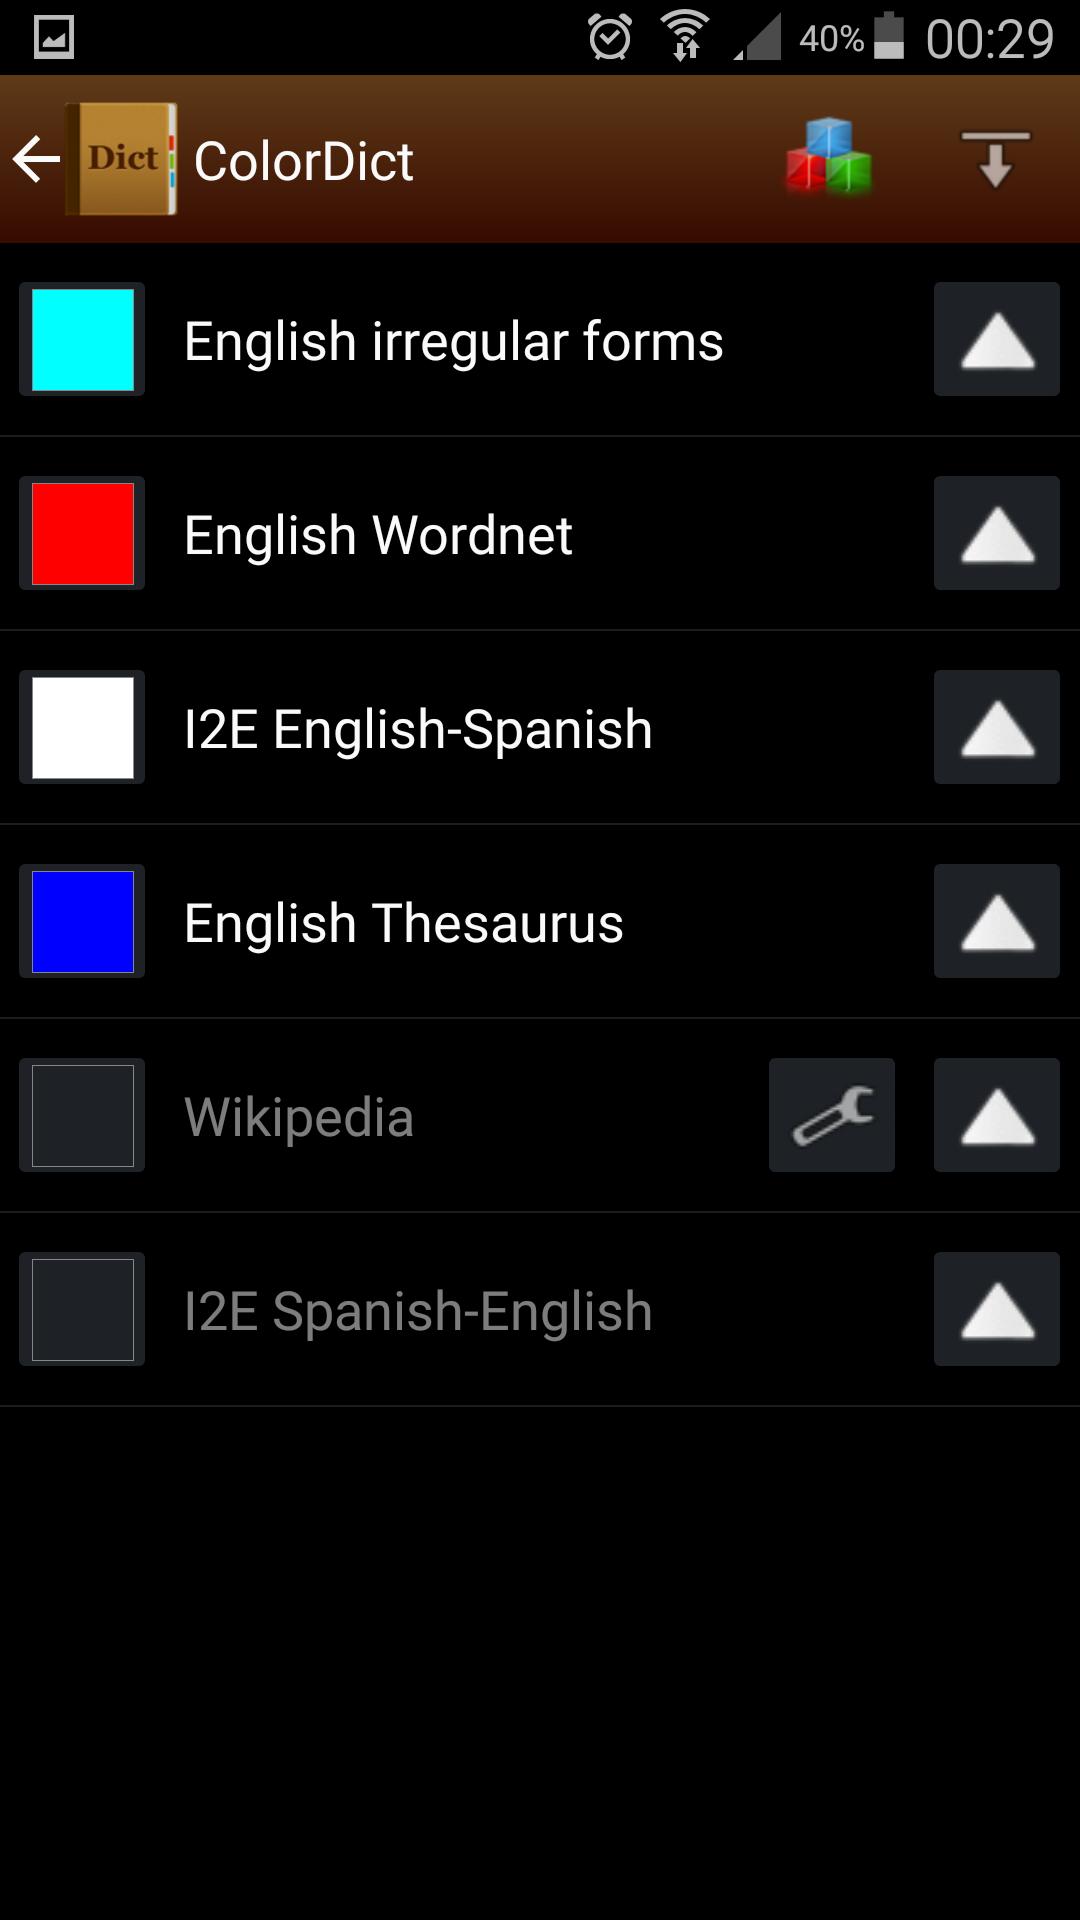 Spanish to english - 2015 04 28 22 29 46